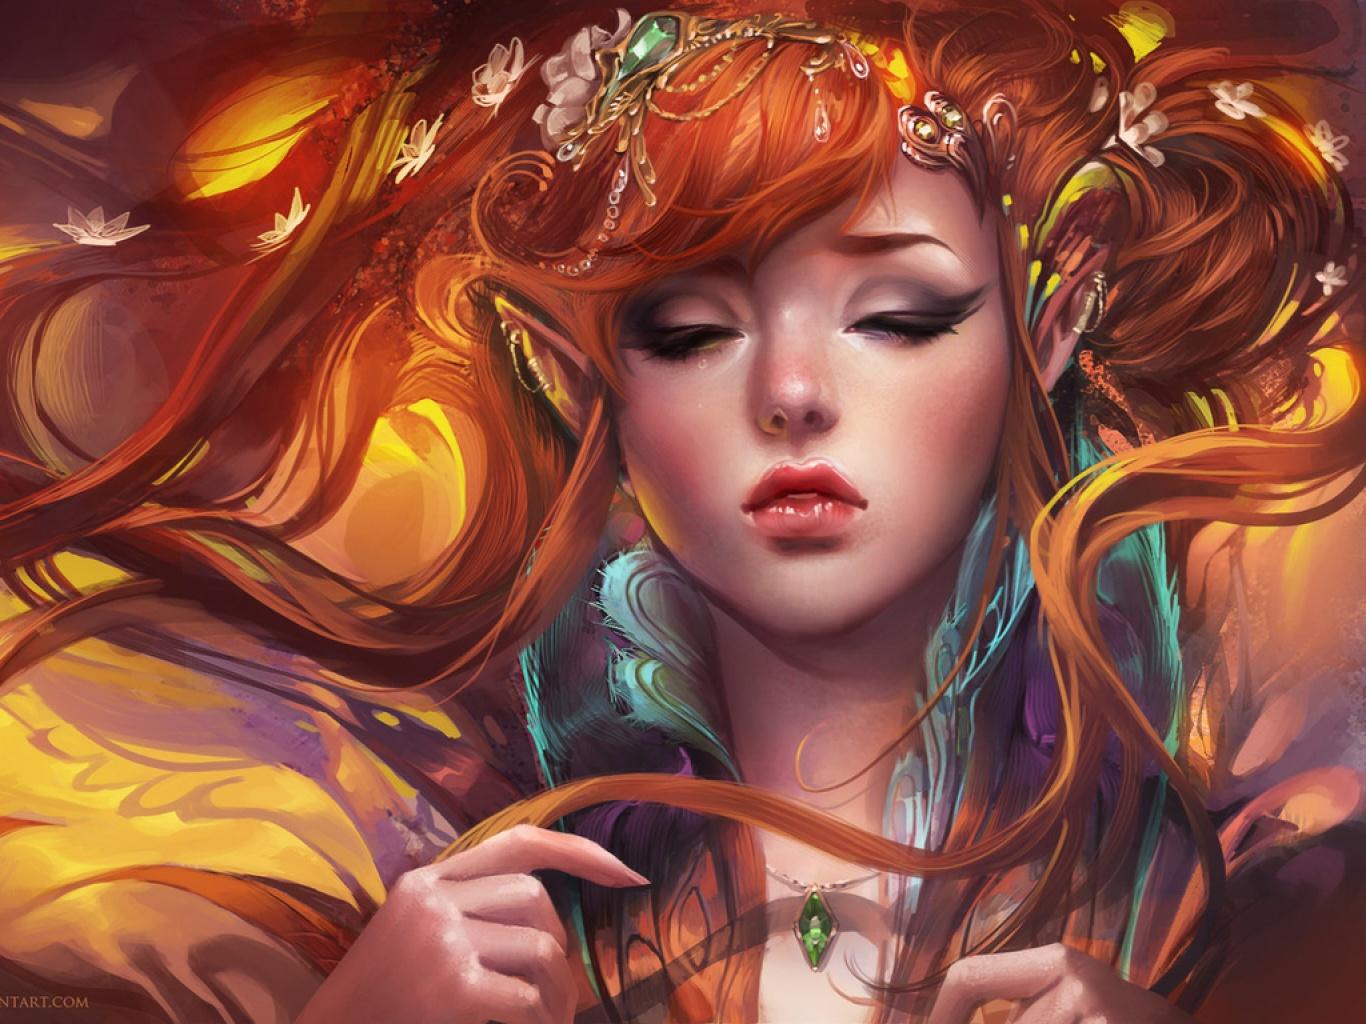 Painting Art Phoenix Fire Fantasy Digital Drawing: Imágenes De Chicas Anime, Fondos De Chicas Anime, Wallpapers